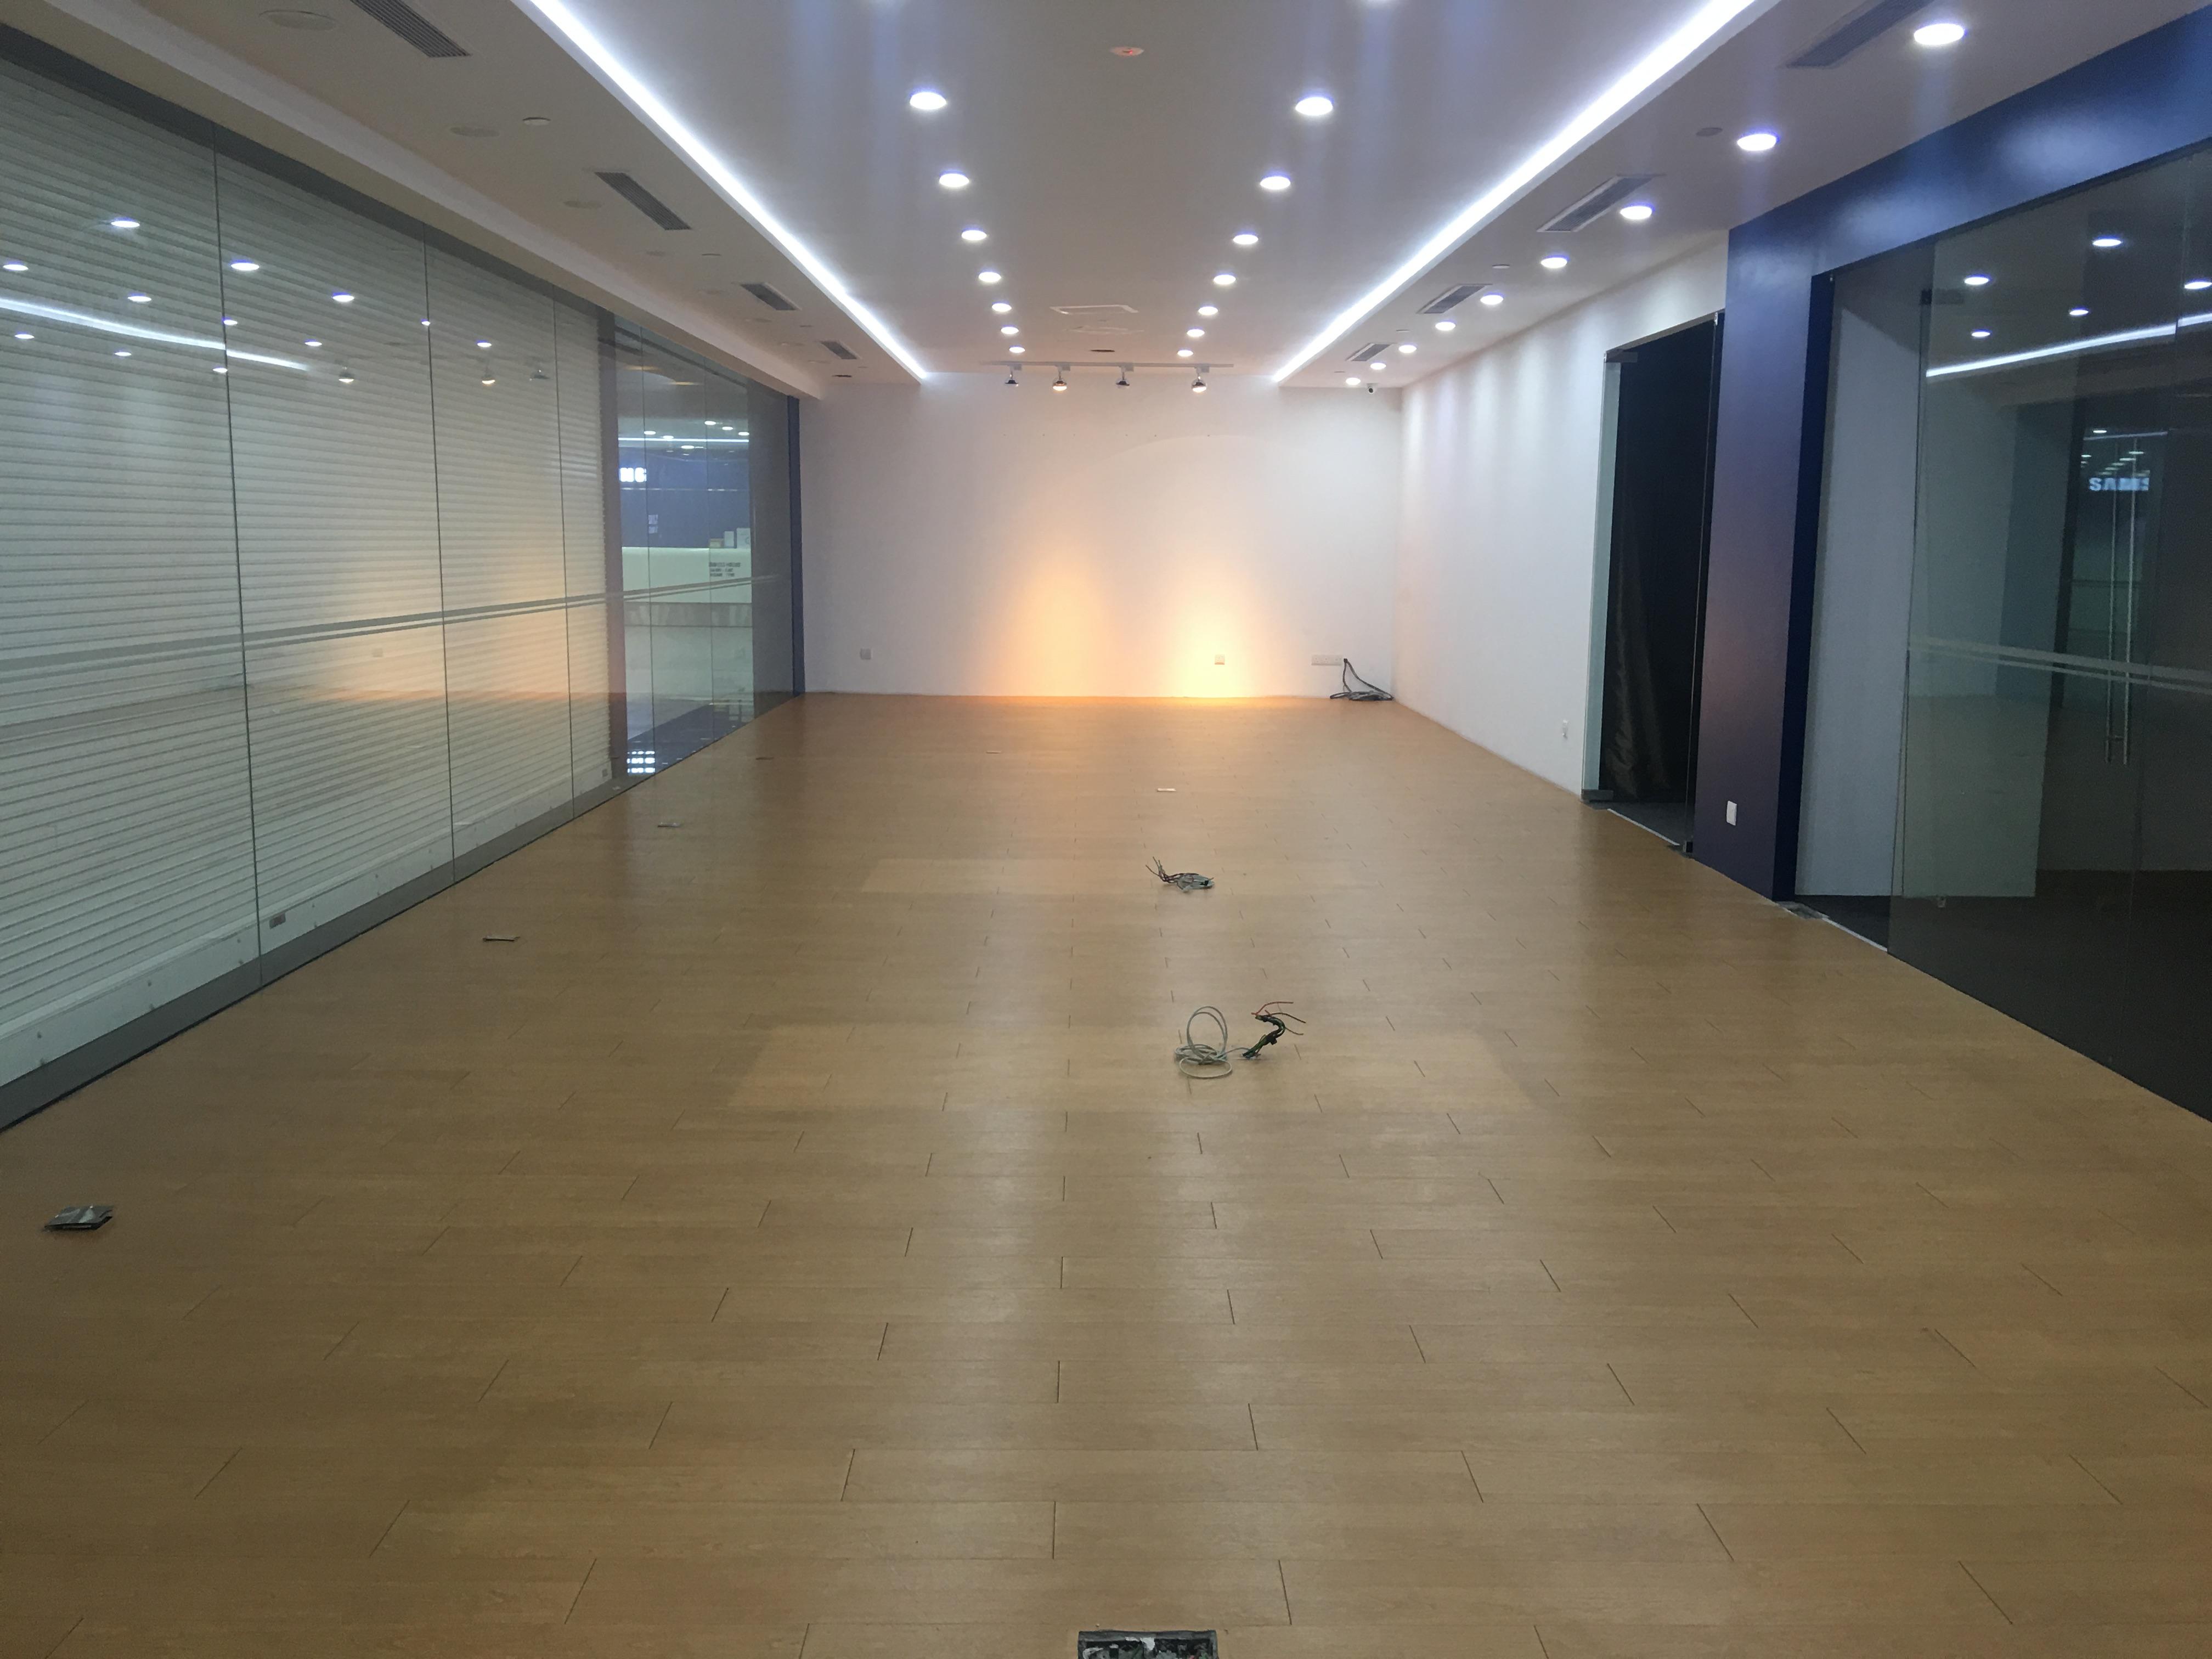 Wisma Bentley Music - Mutiara Damansara - Search Office KL